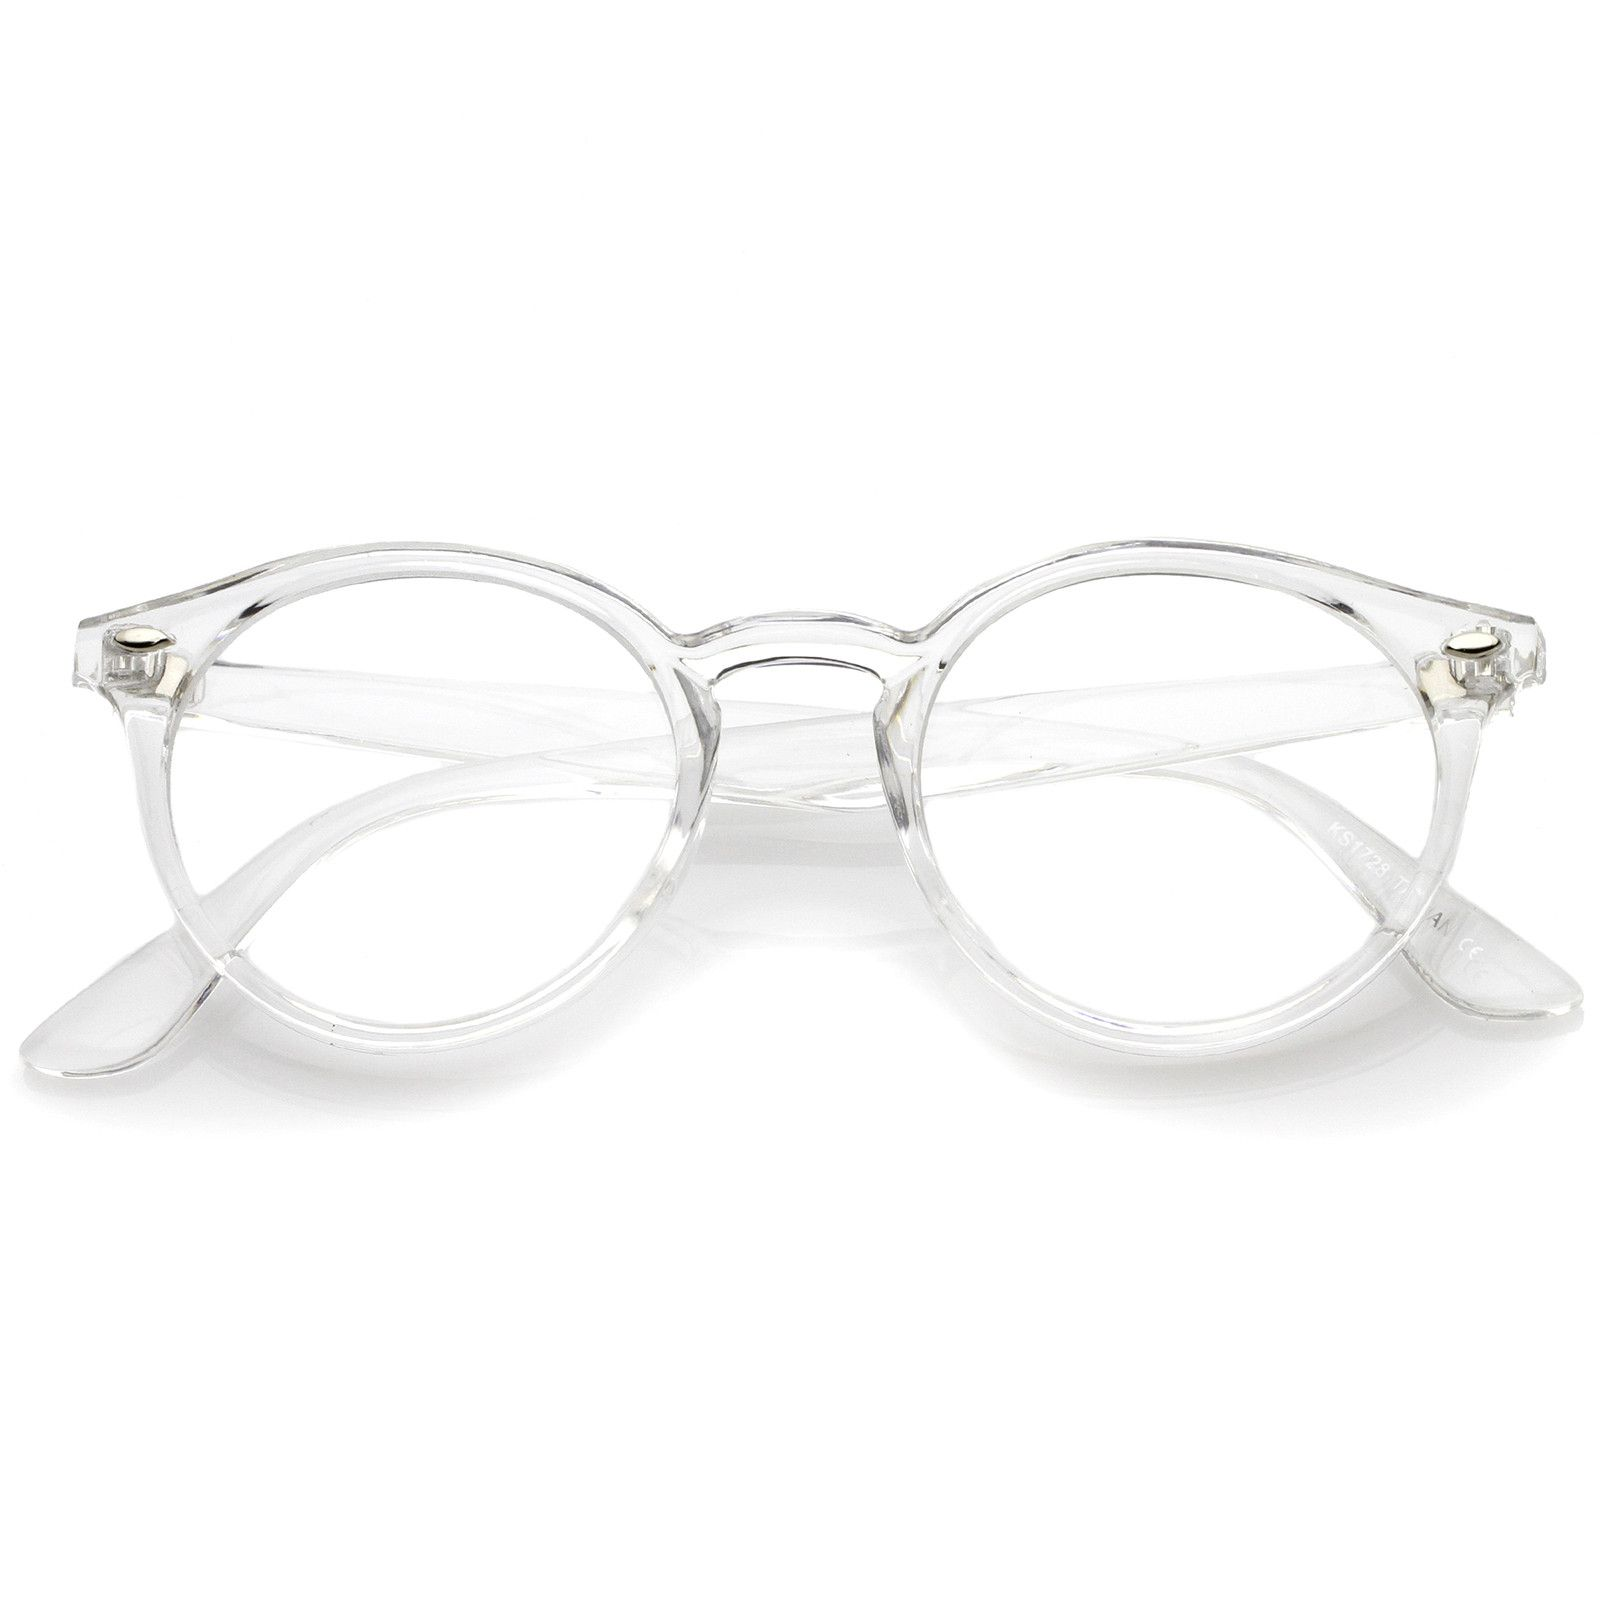 Classic Translucent Horn Rimmed Clear Lens P3 Round Eyeglasses 49mm Clear Round Glasses Clear Glasses Frames Hipster Glasses